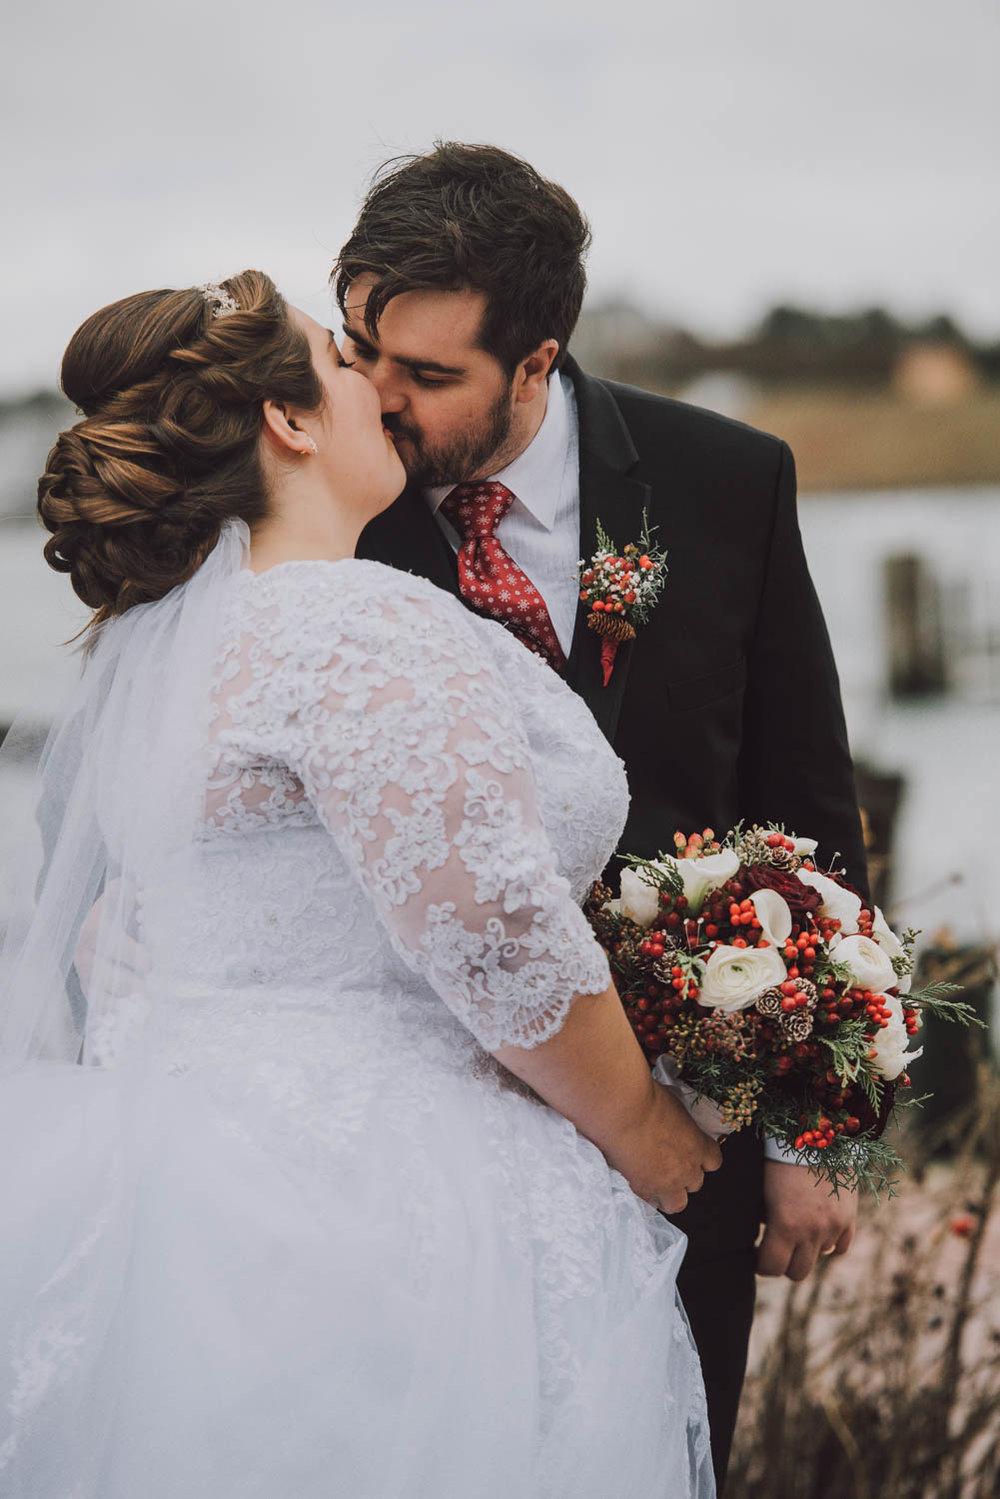 lauren-noah-couple-wedding-photography1.jpg